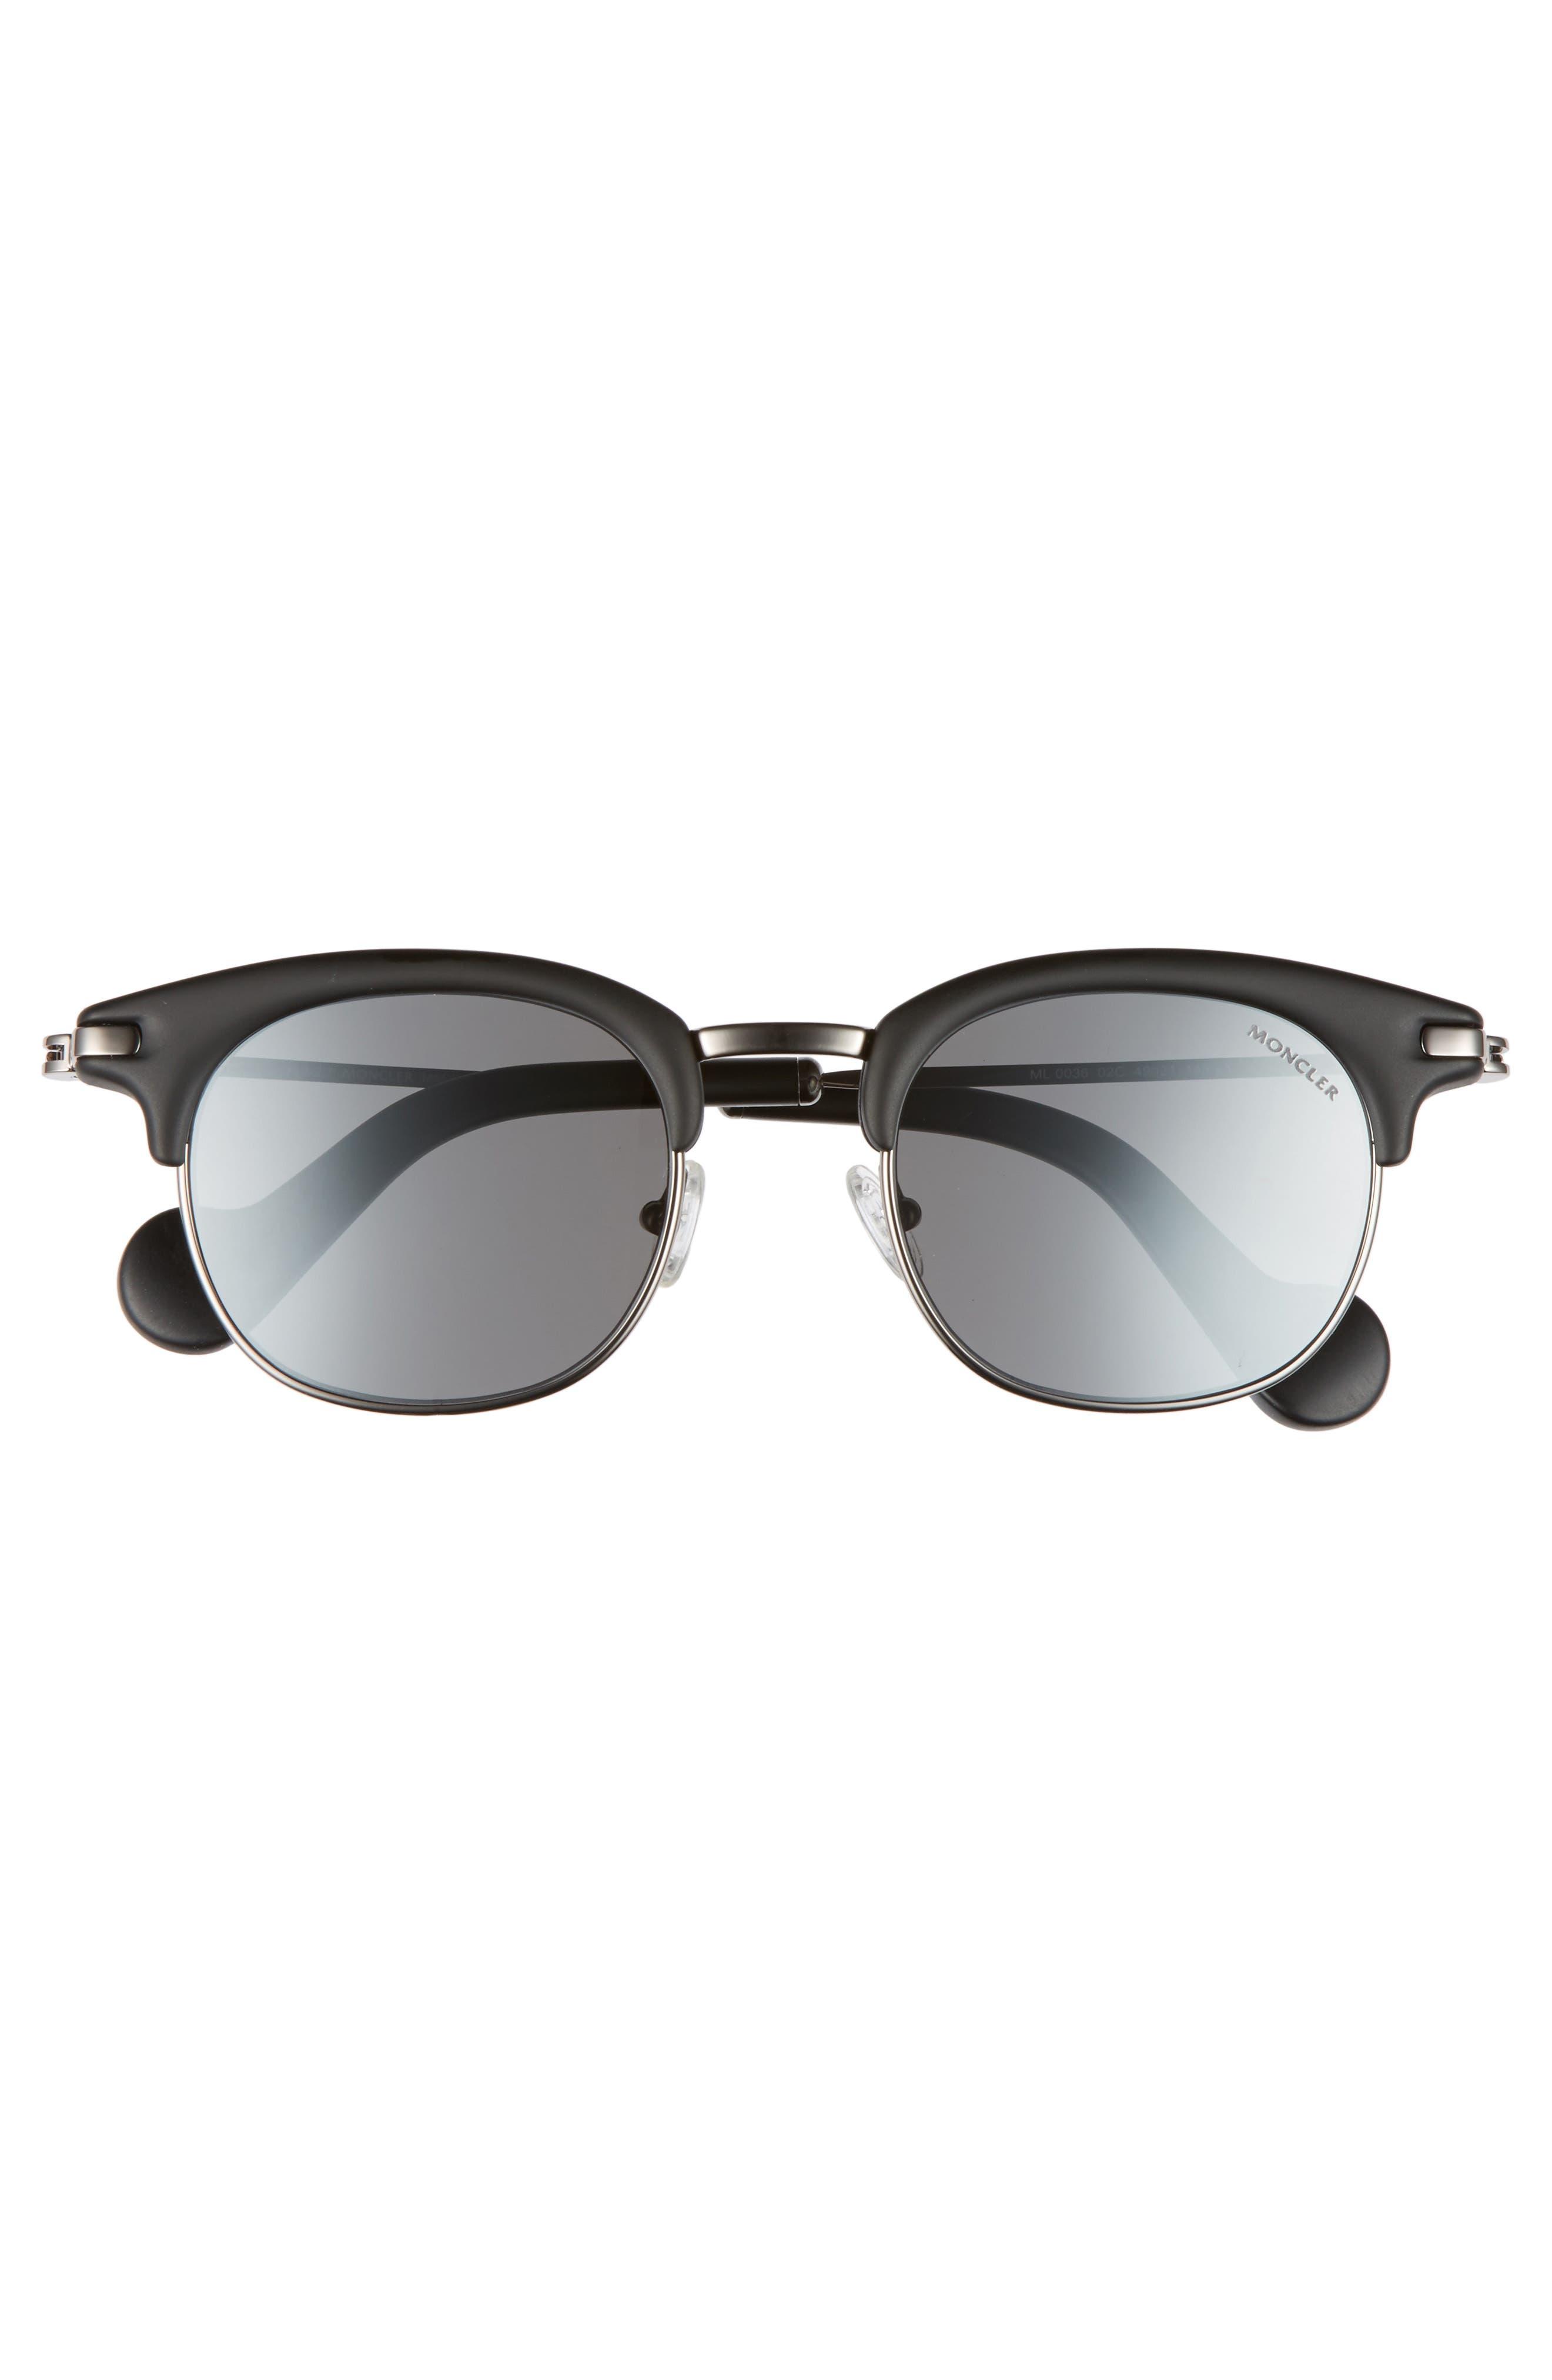 49mm Sunglasses,                             Alternate thumbnail 2, color,                             MATTE BLACK/ RUTHENIUM